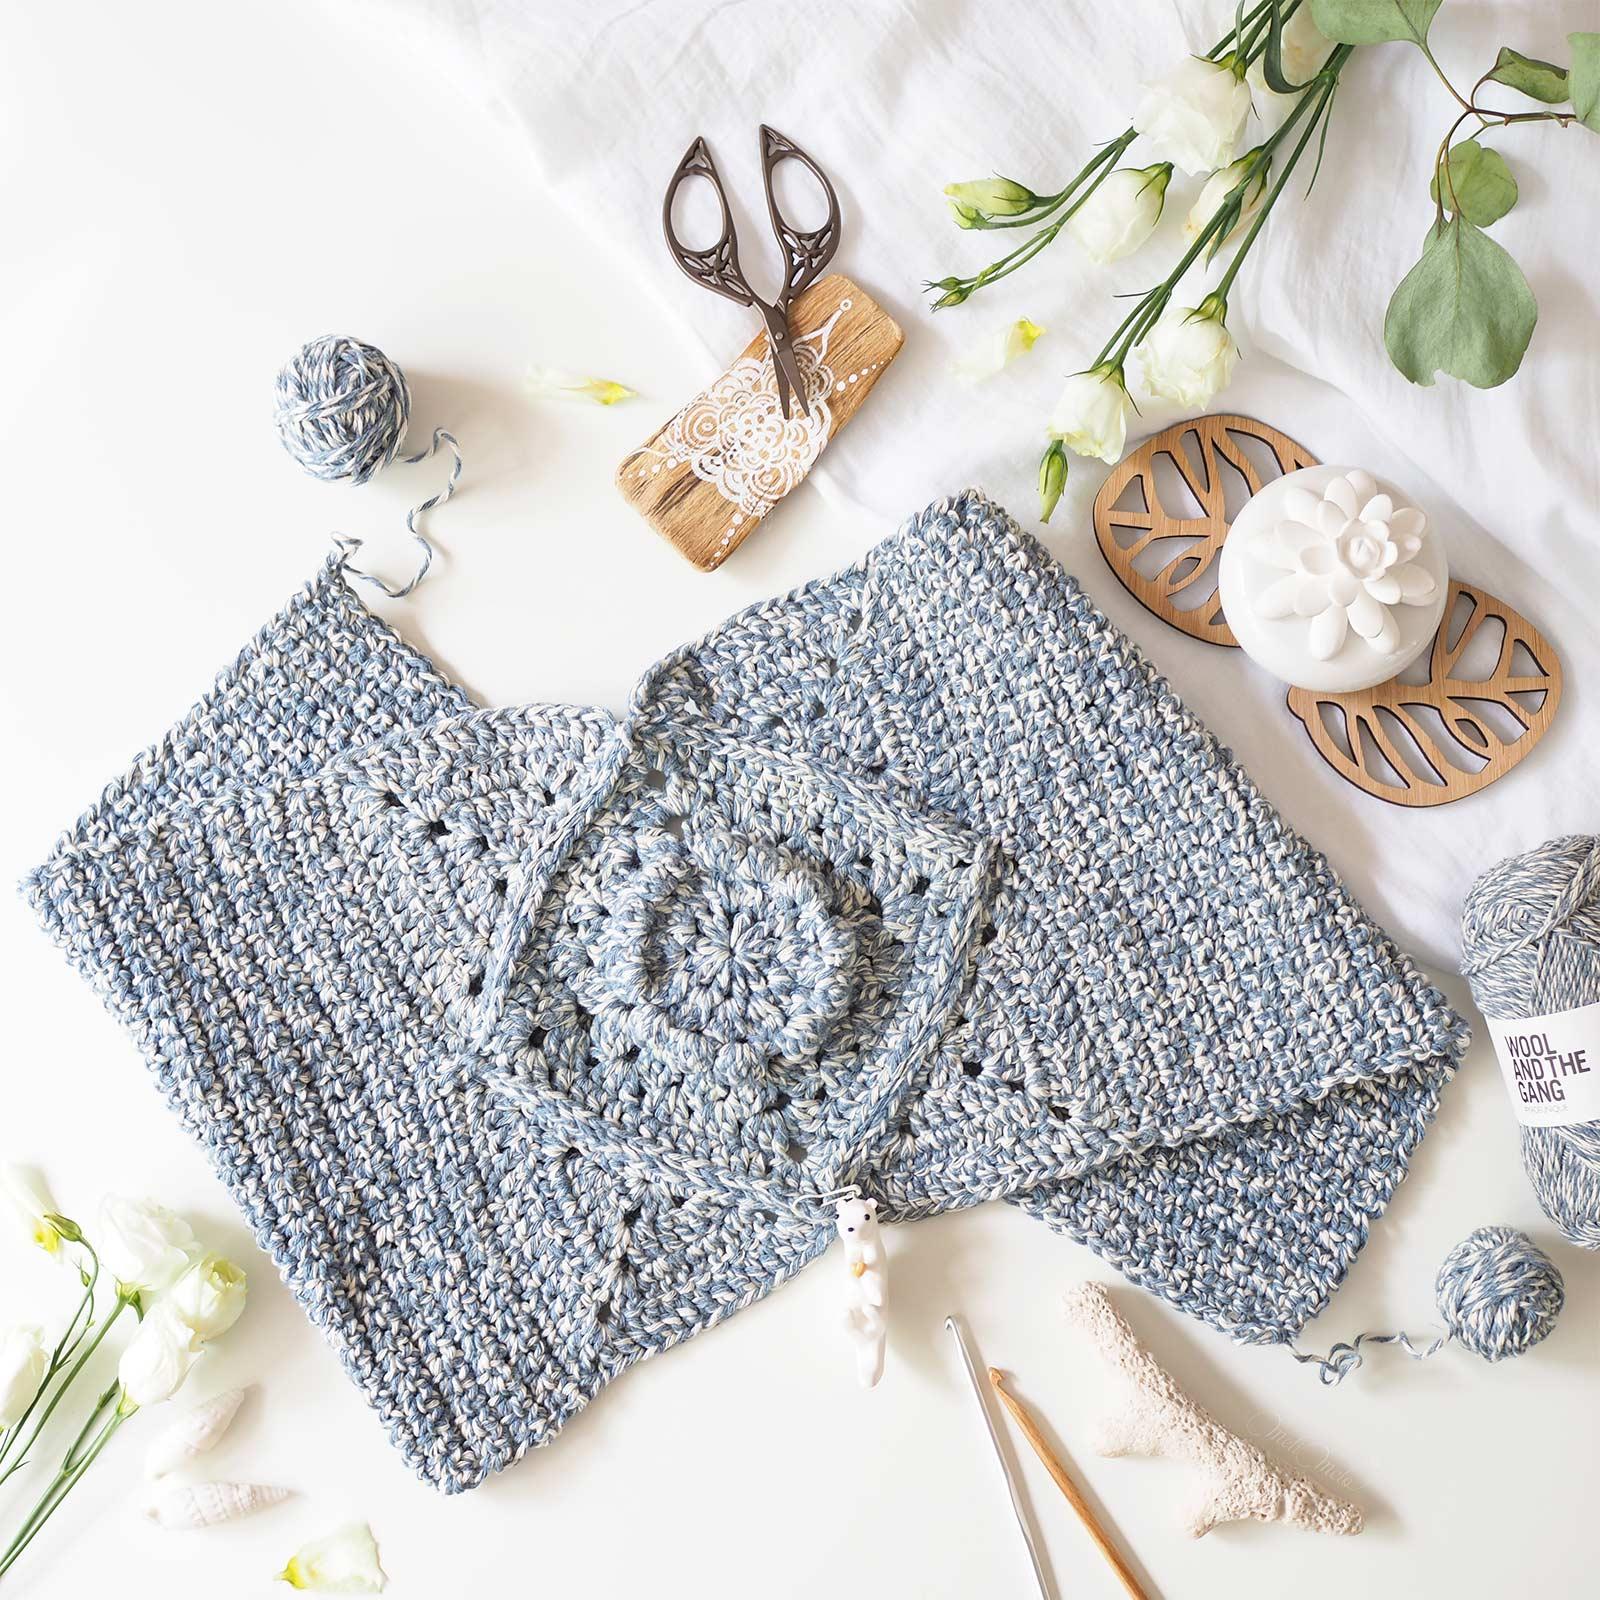 wildrose-backpack-side-crochet-sac billie jean yarn watg laboutiquedemelimelo